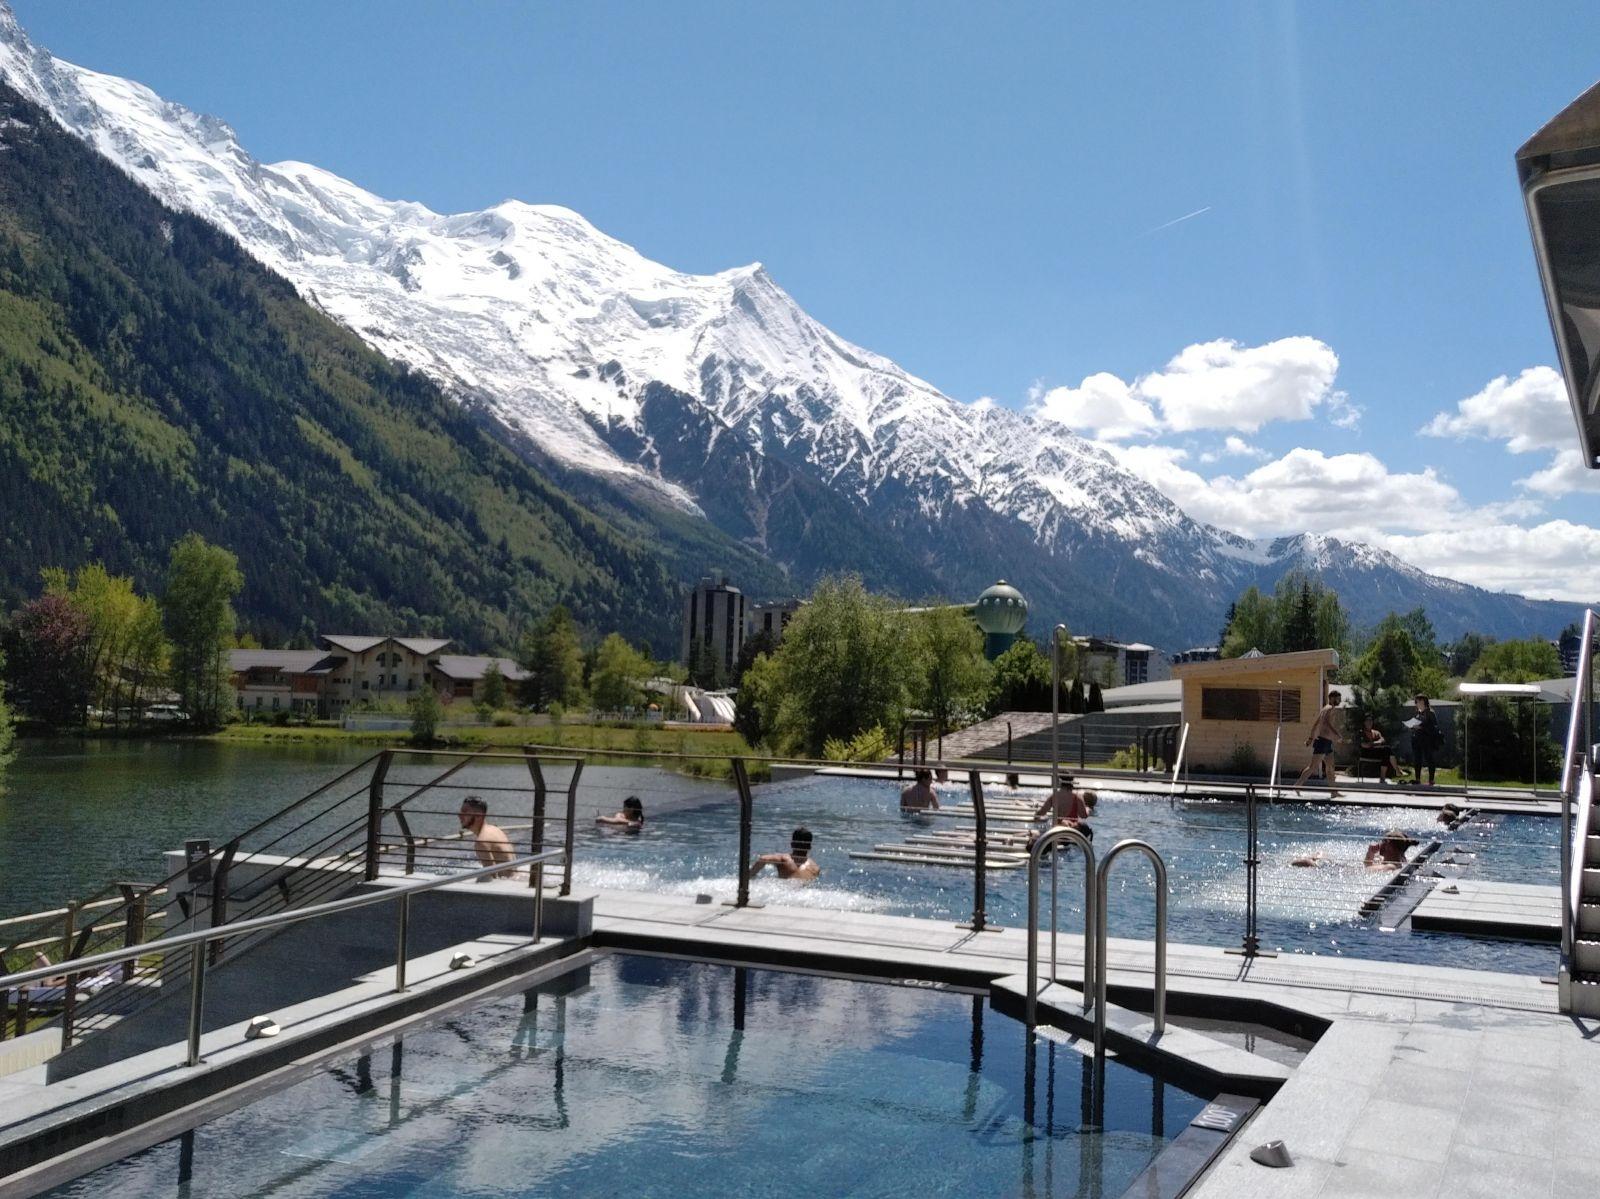 Massage, Hammam, Sauna, Soins Esthétiques, Piscine Etc ... à Chamonix Piscine